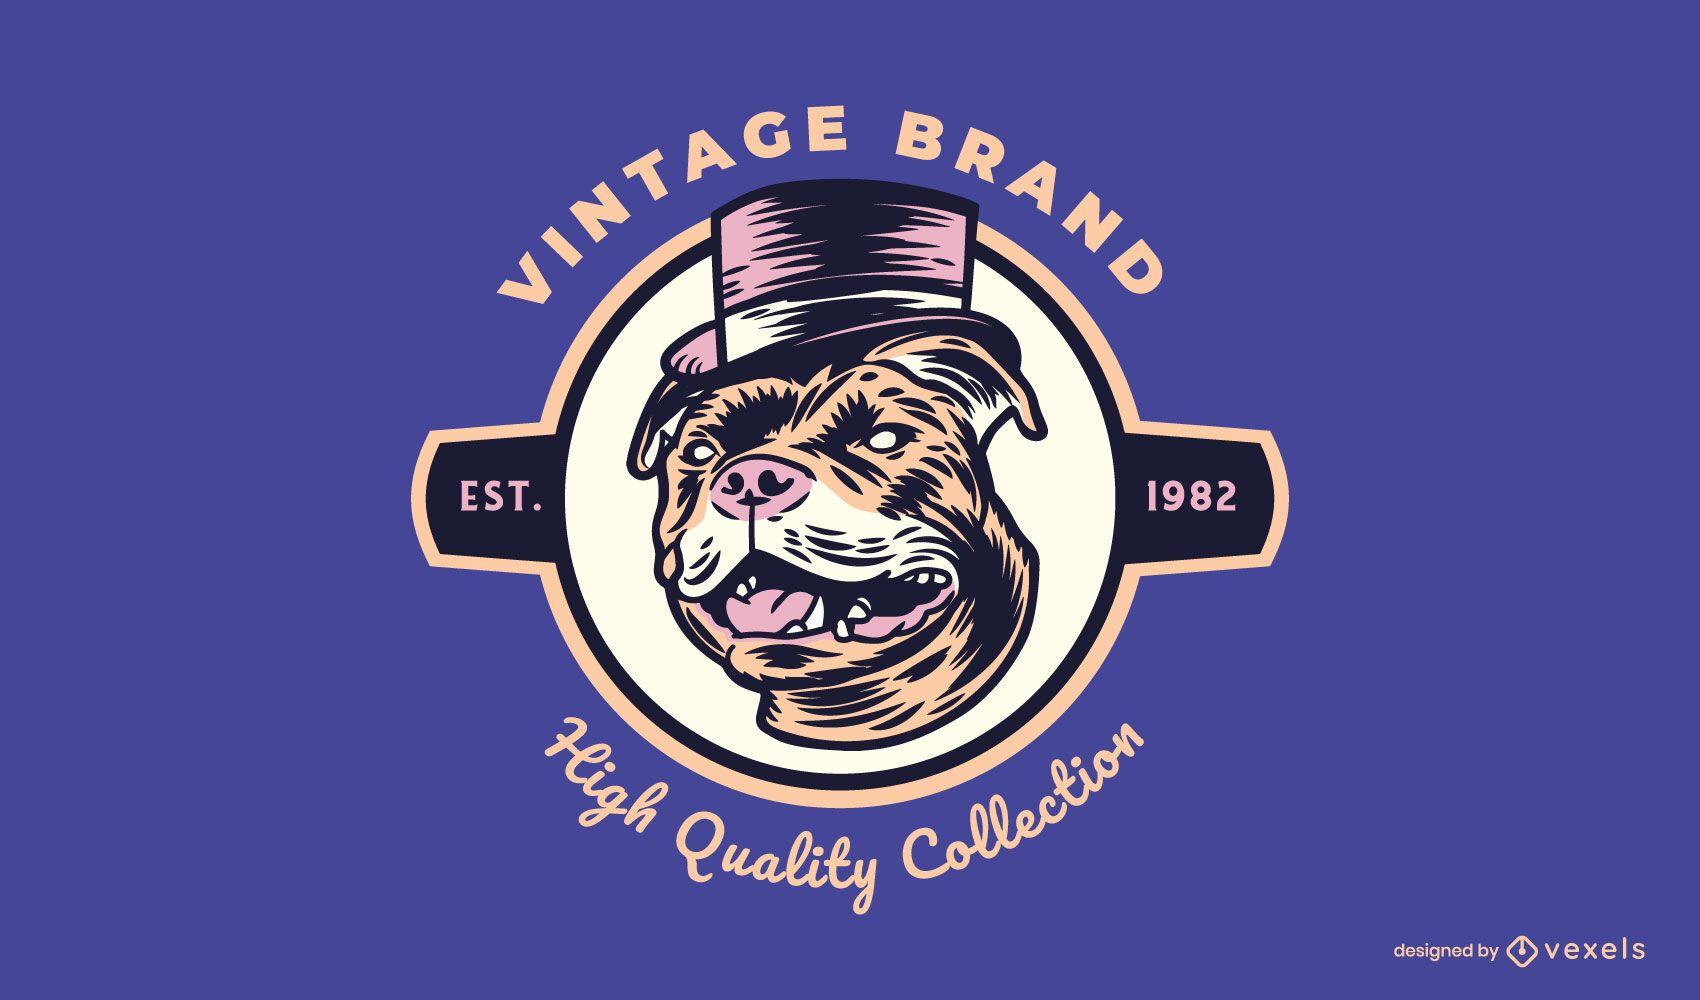 Plantilla de logotipo de pitbull vintage